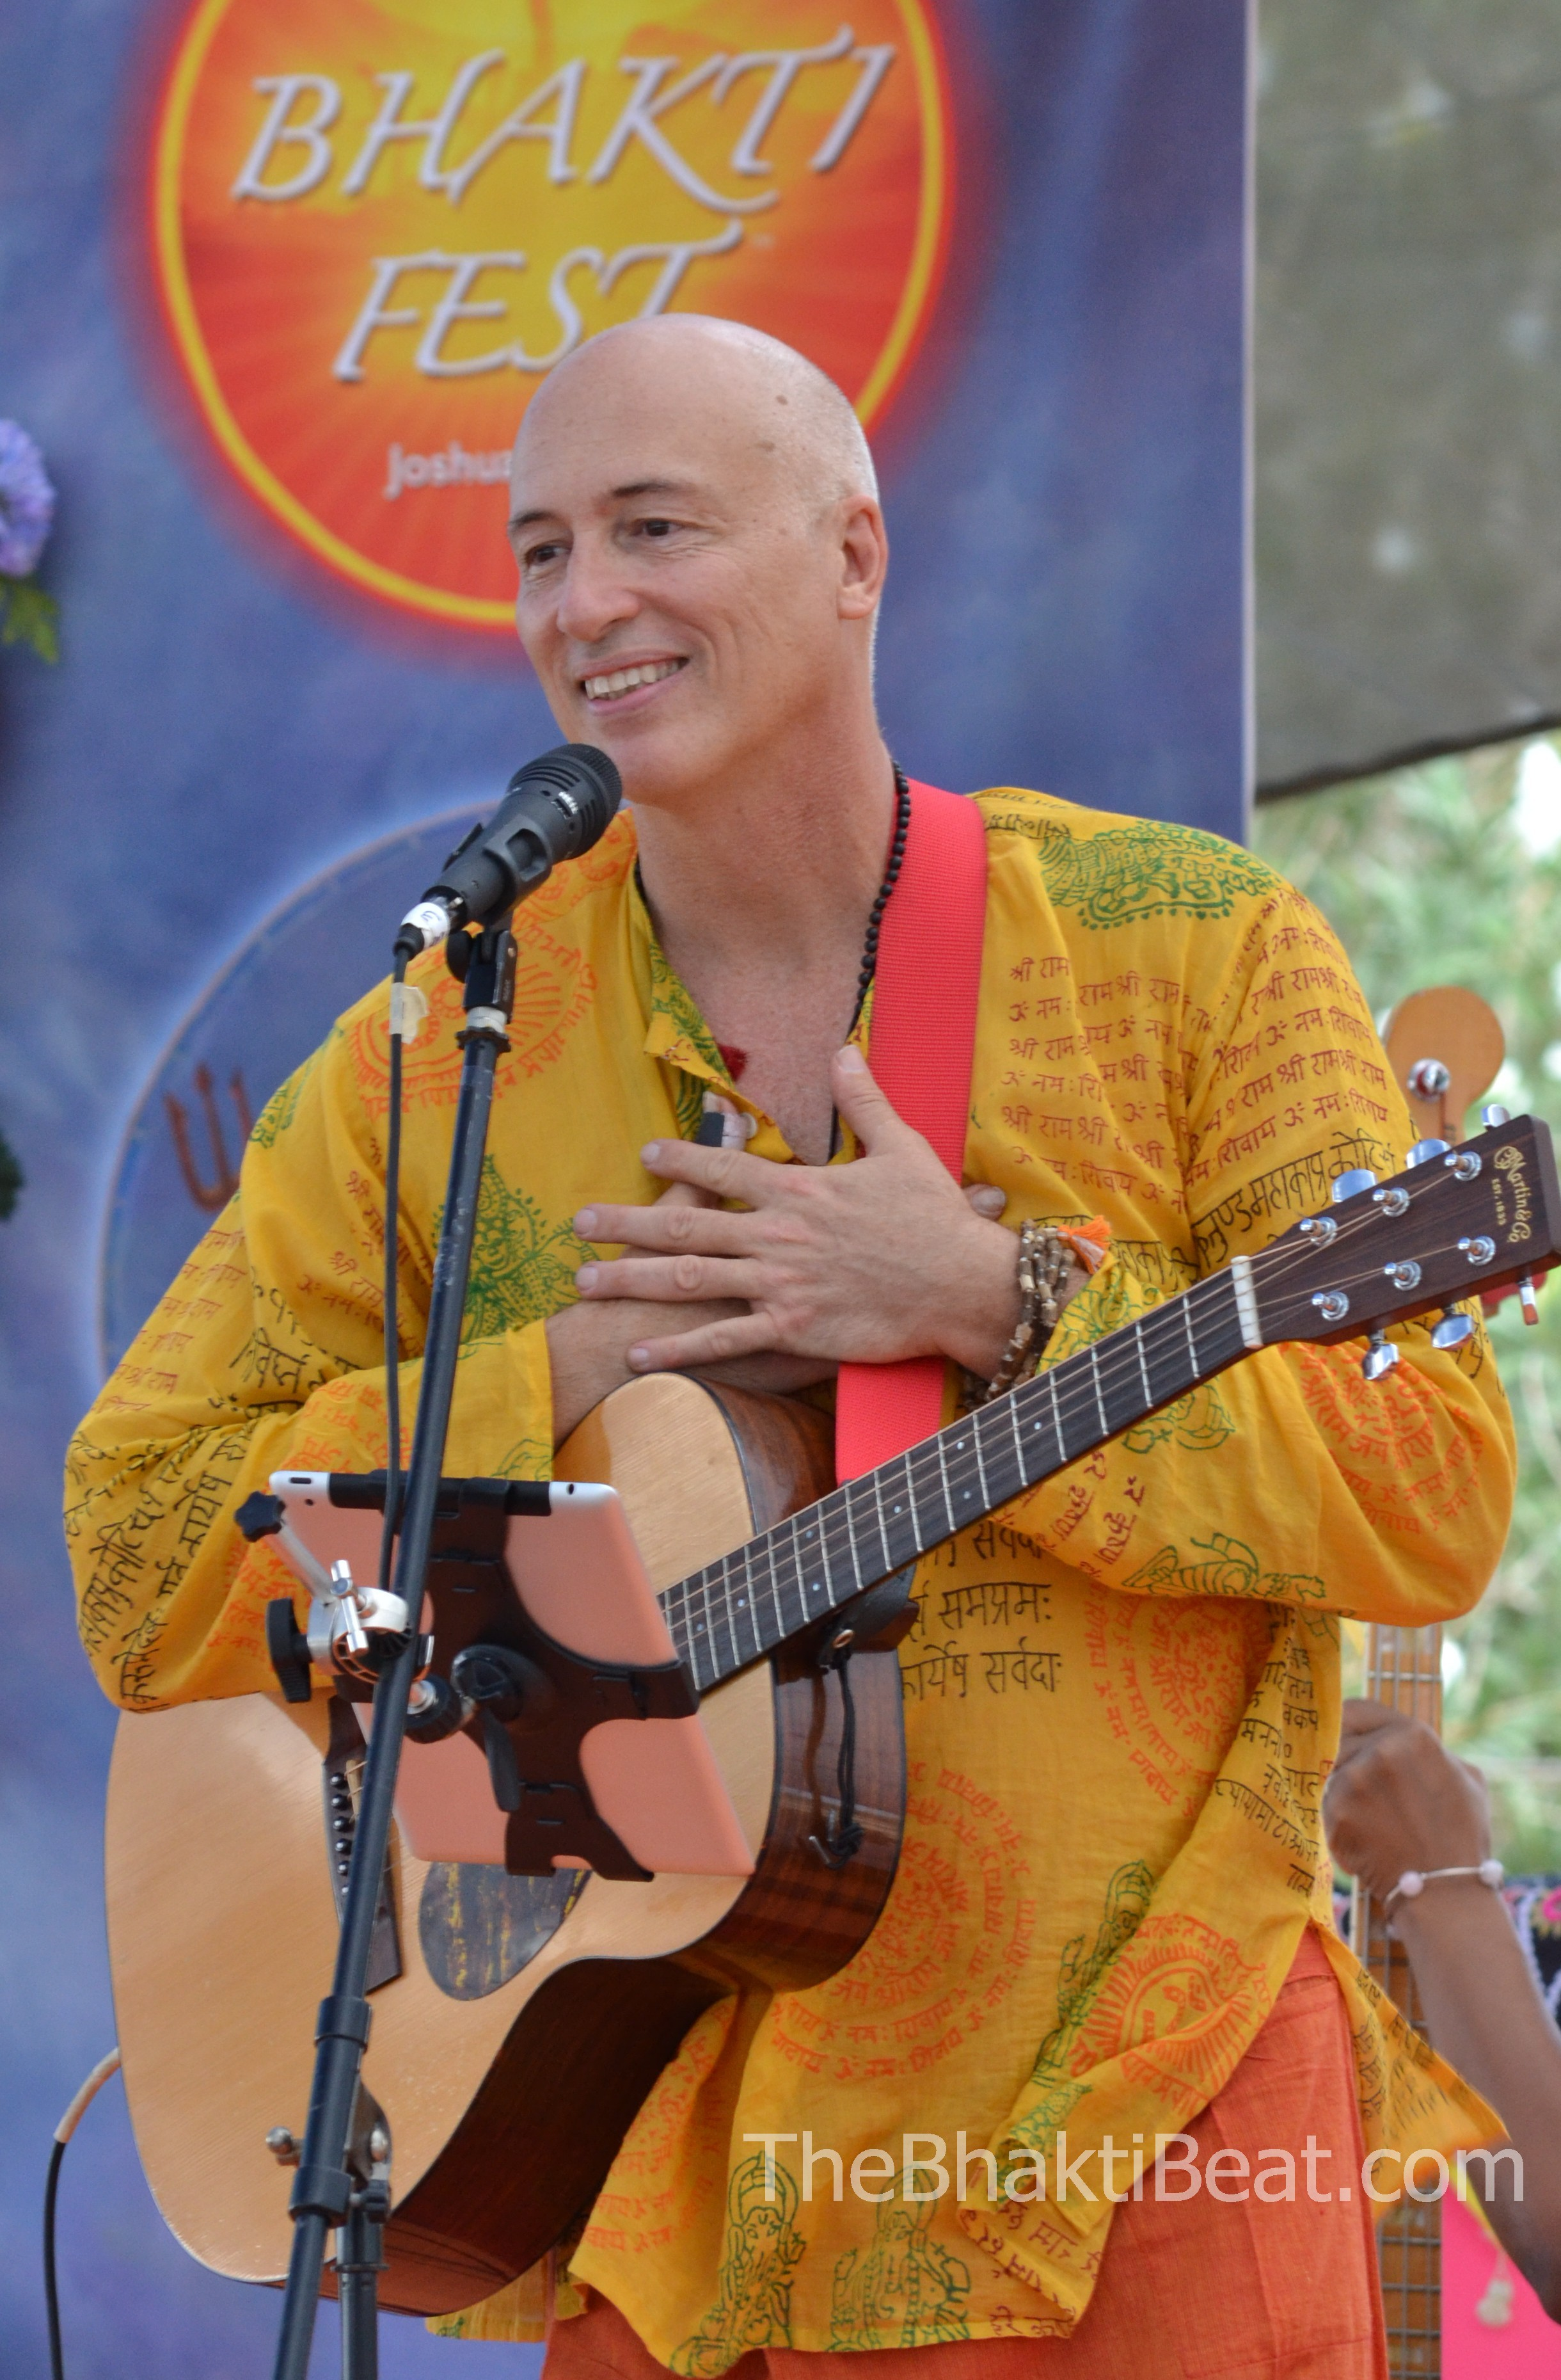 Jim Beckwith, Bhakti Fest, by TheBhaktiBeat.com